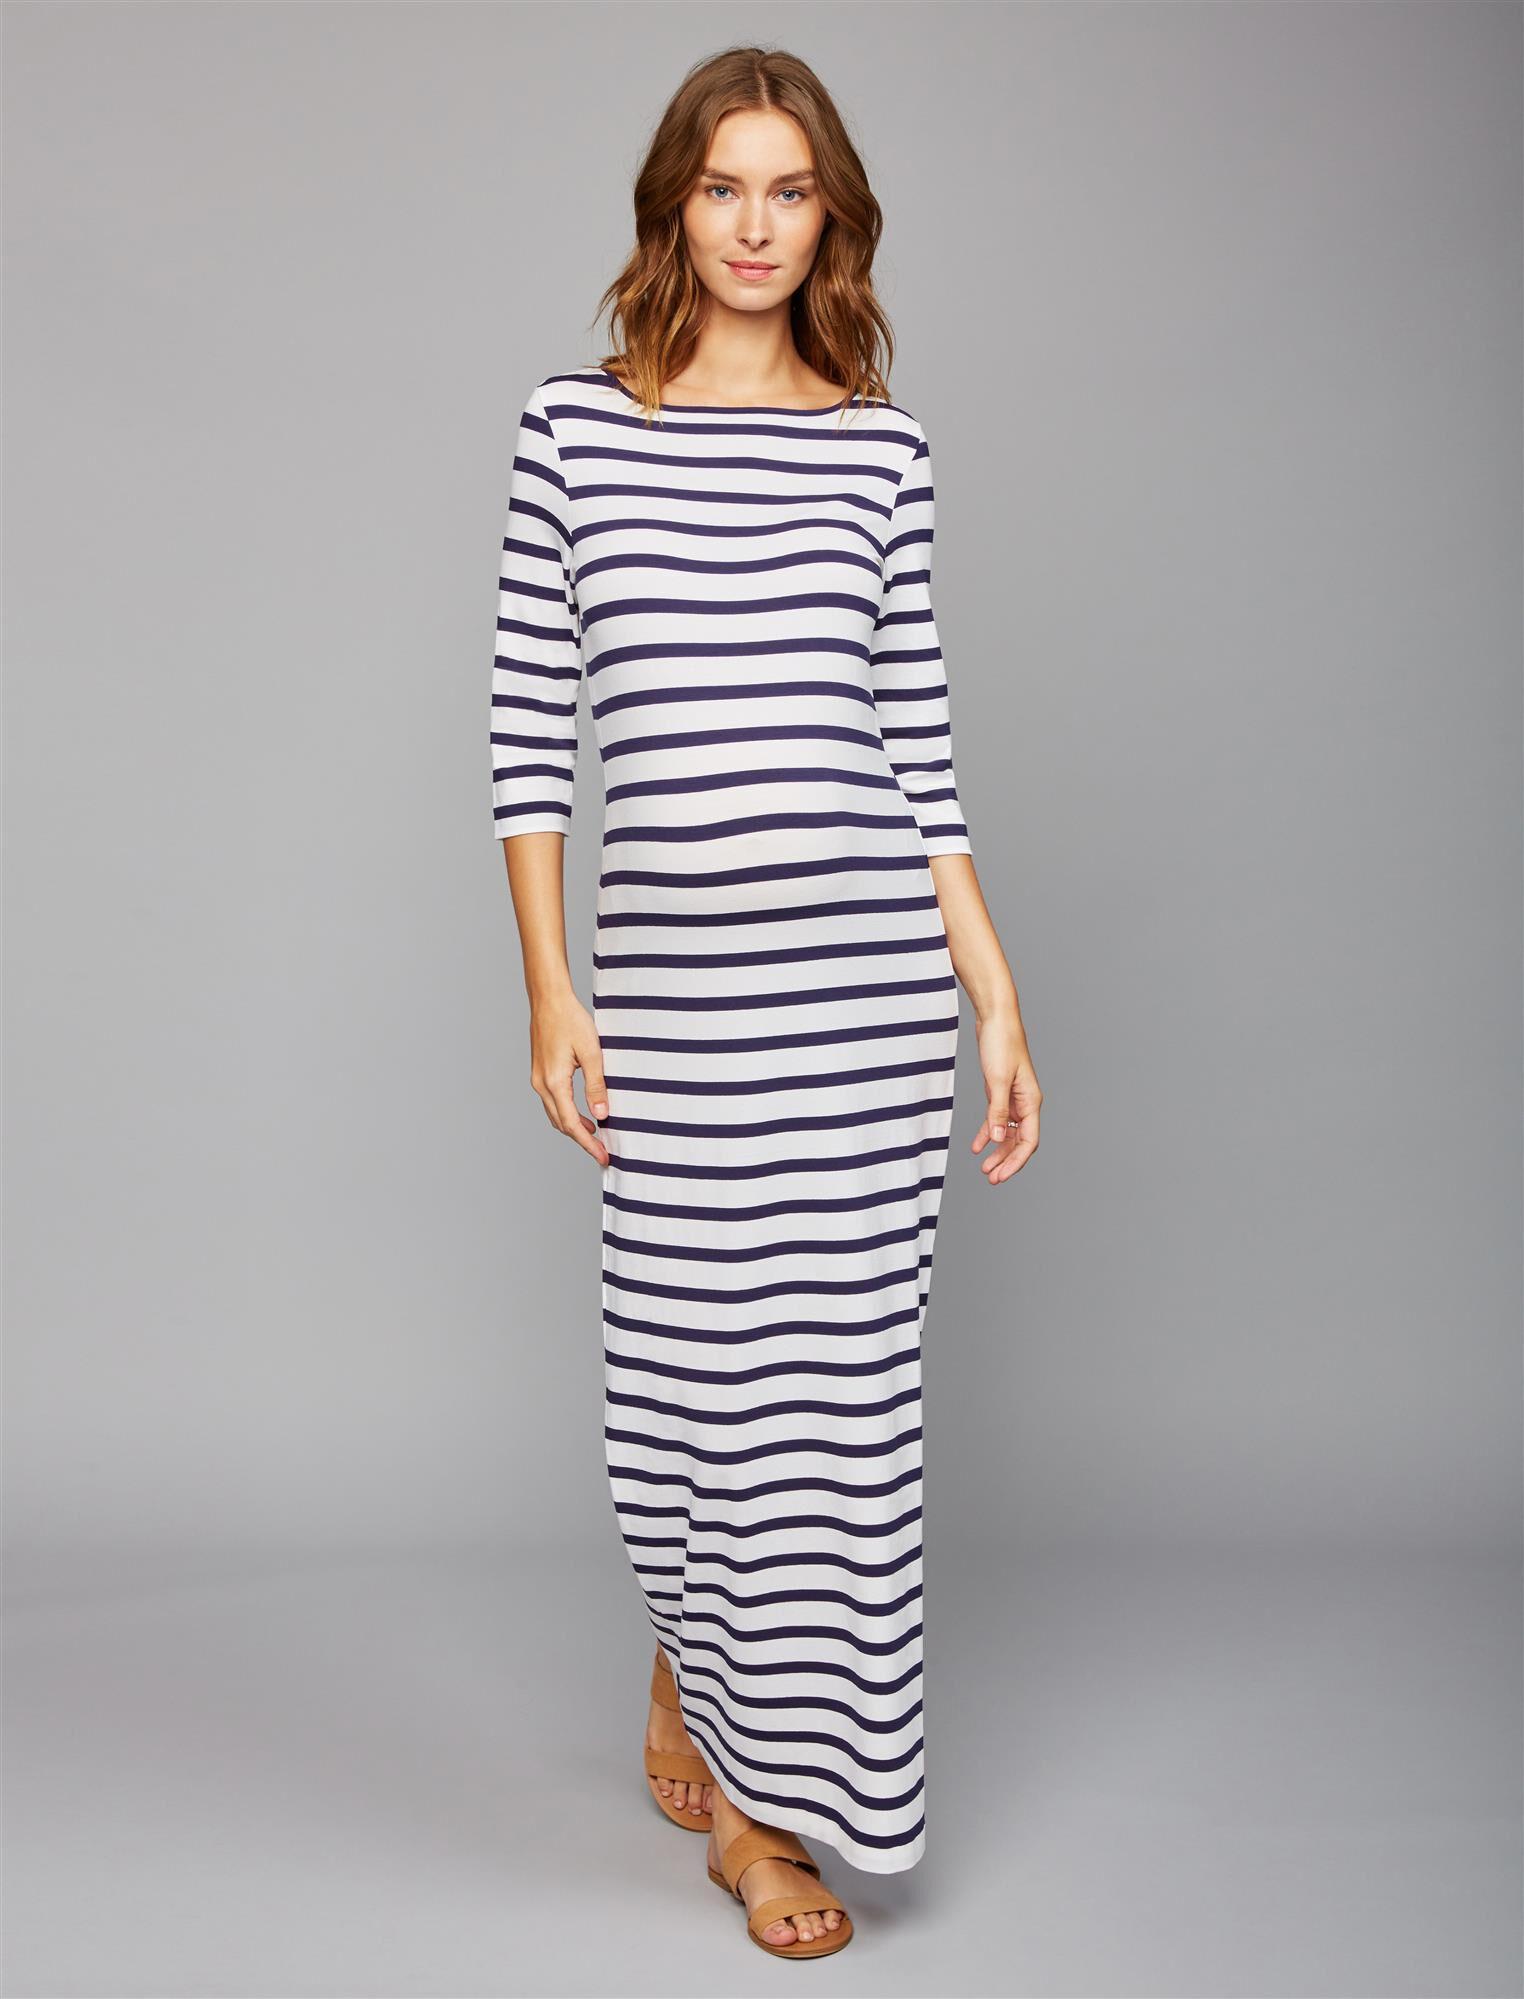 Pietro Brunelli Striped Maternity Maxi Dress